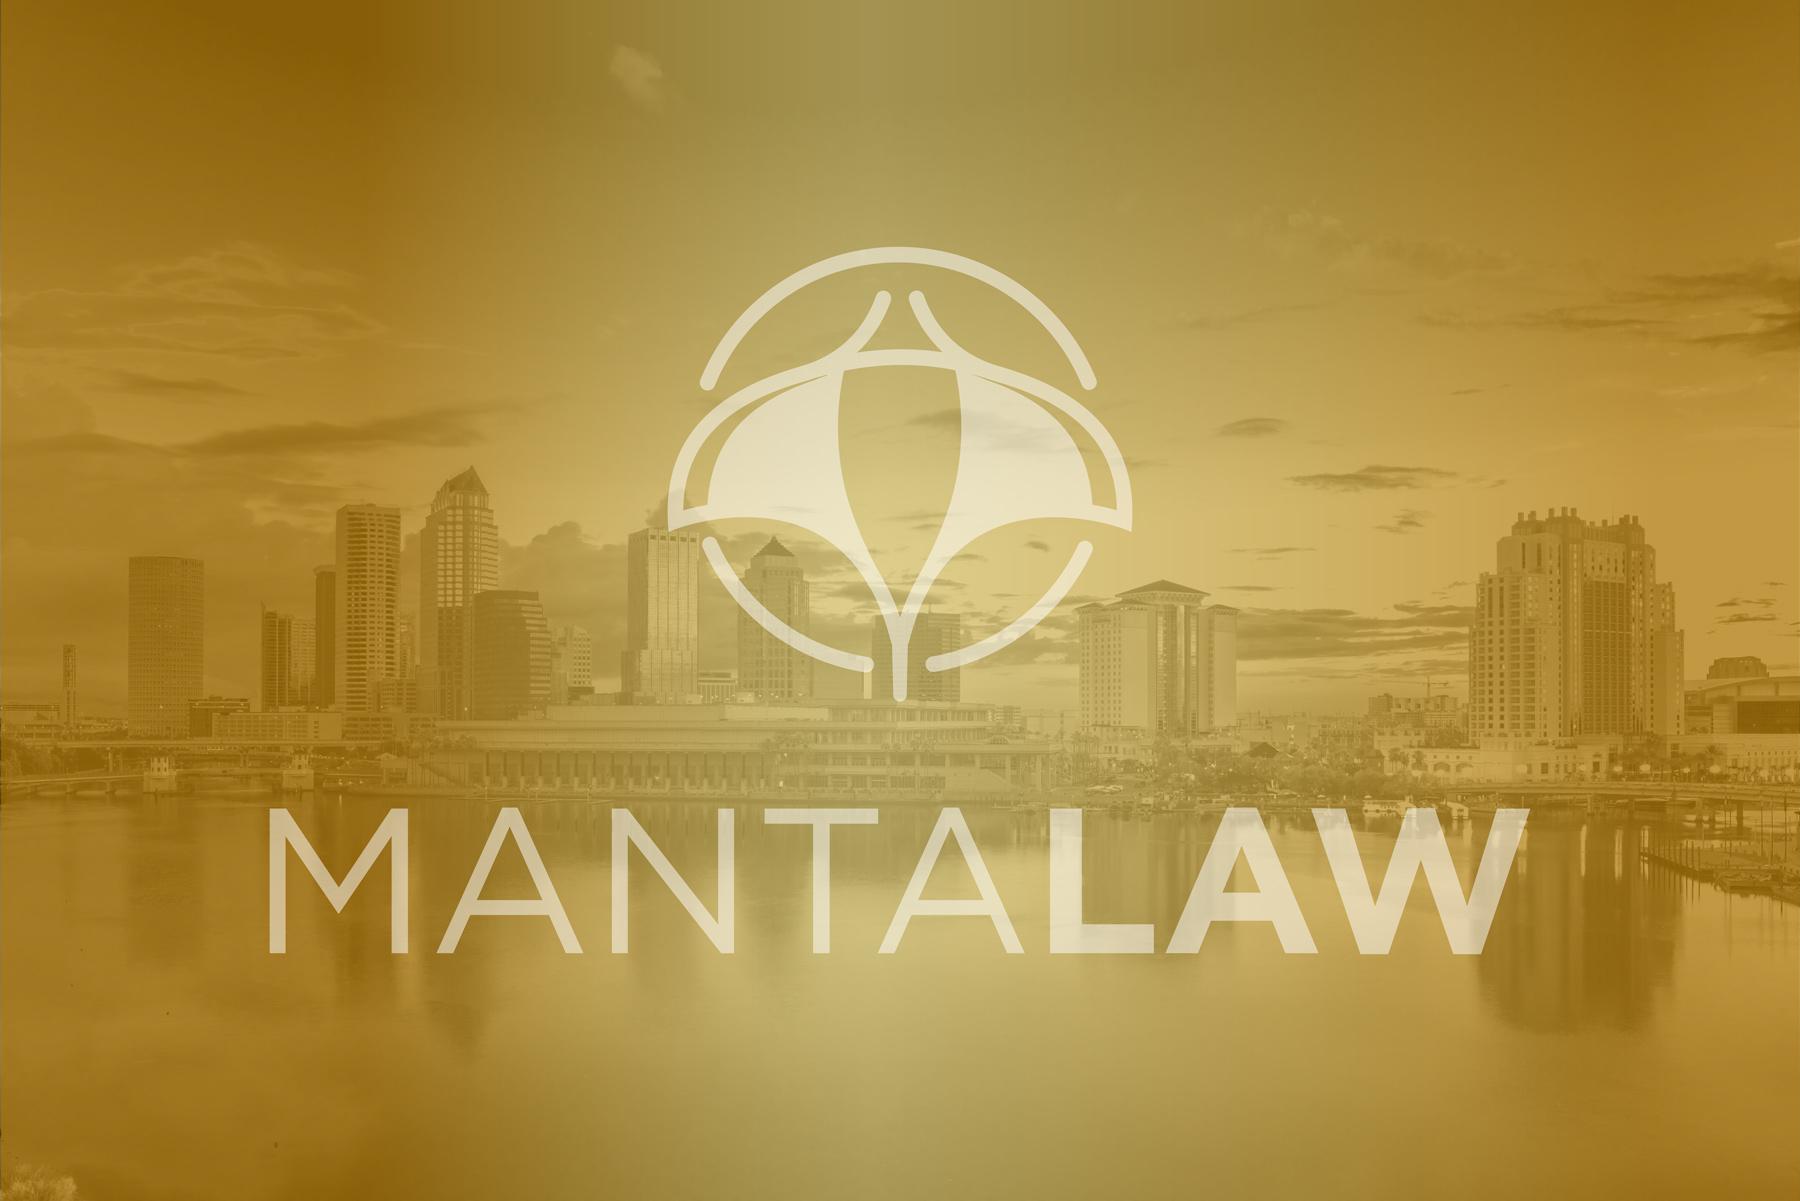 Manta Law Tampa Skyline